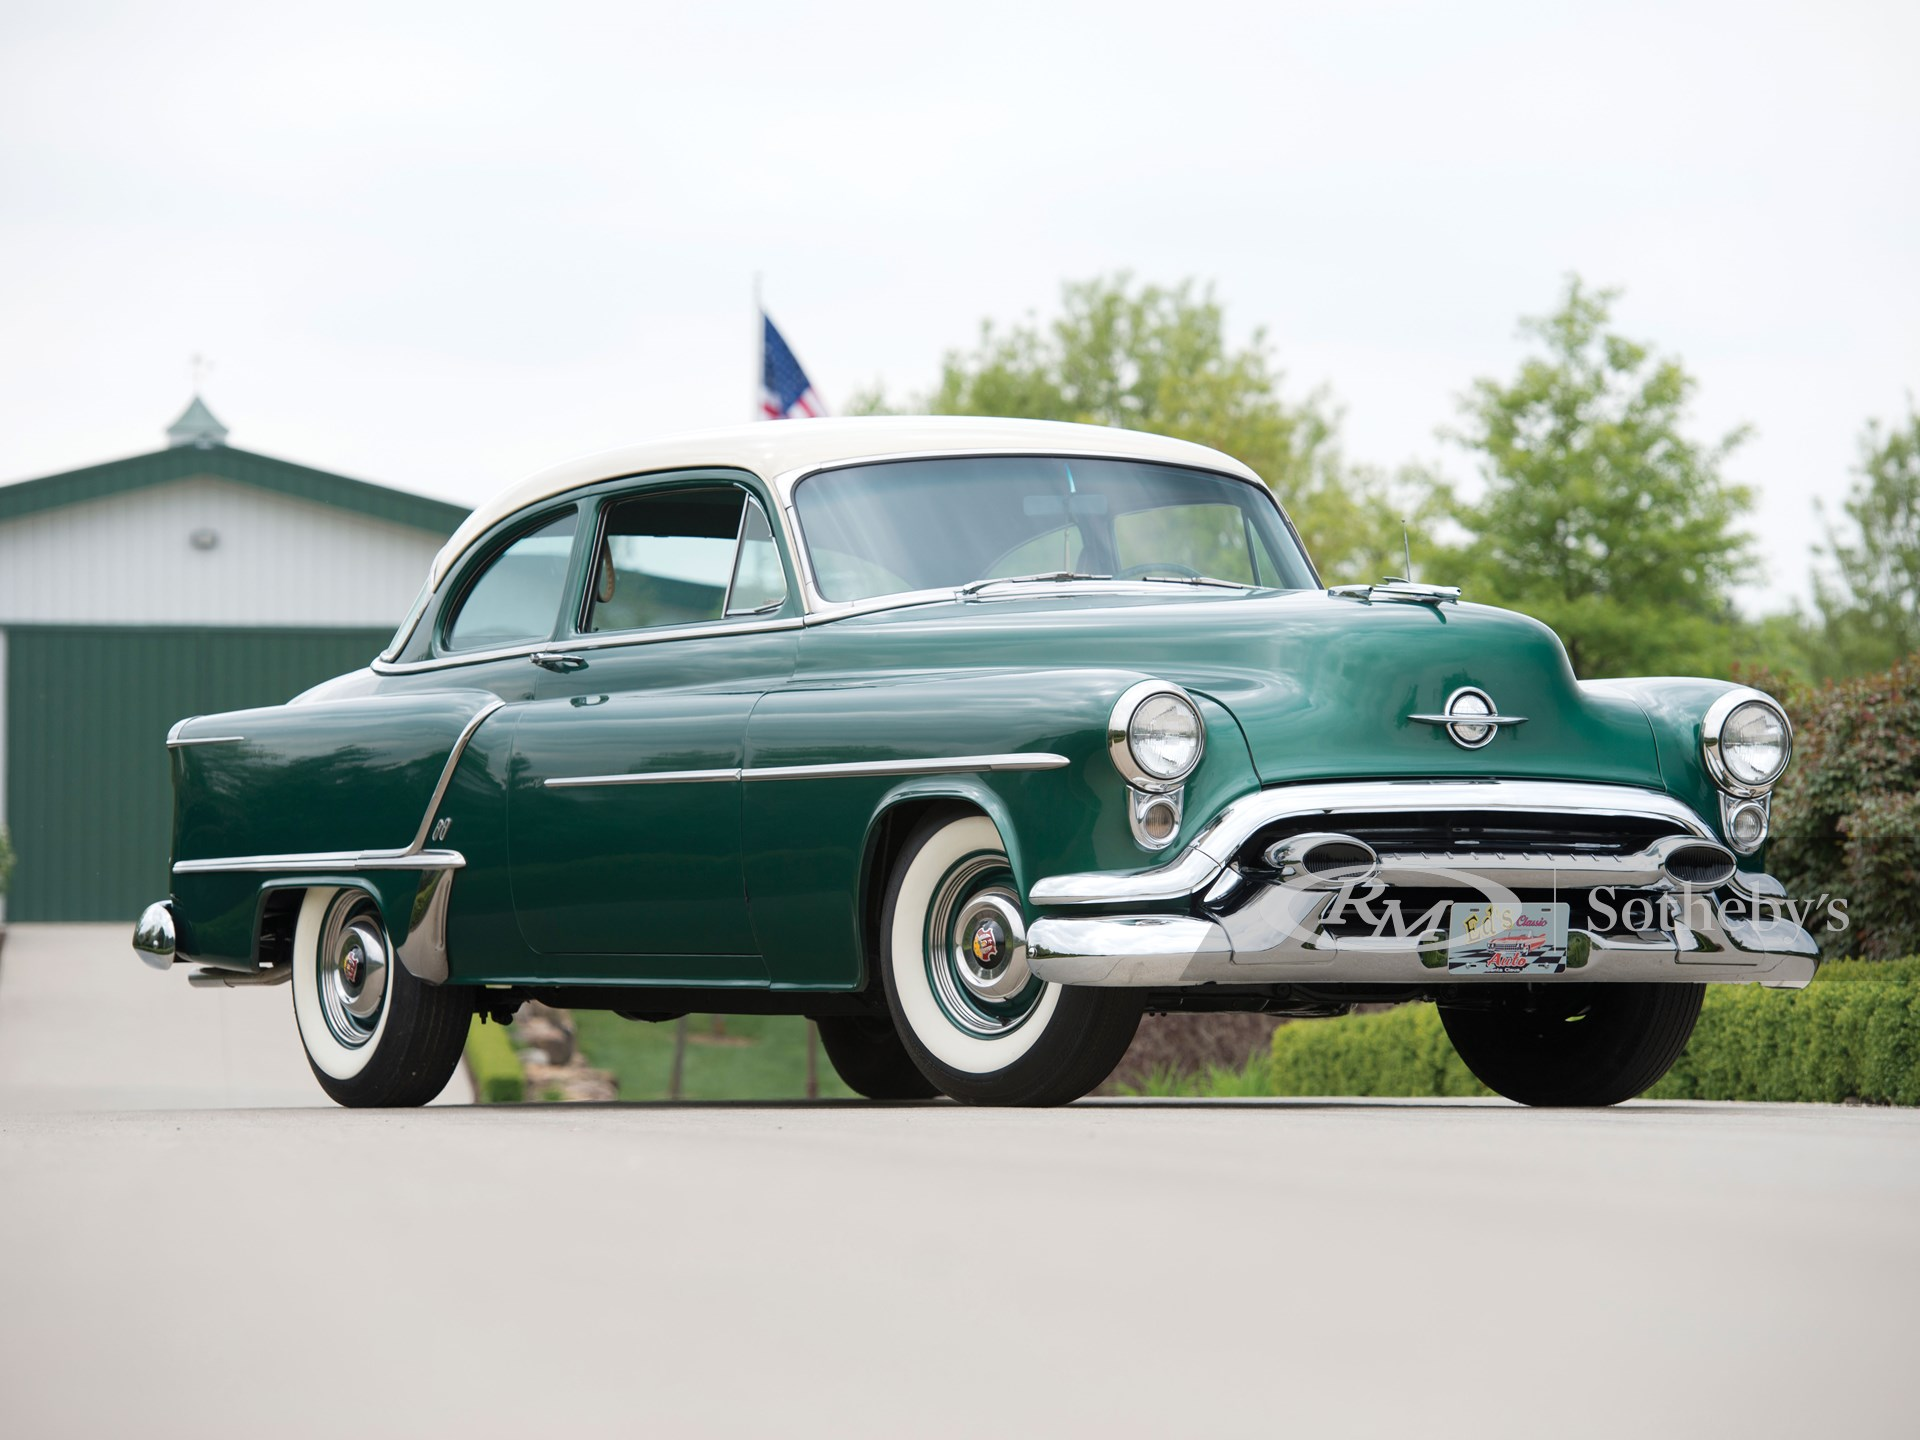 1953 Oldsmobile Super 88 Deluxe